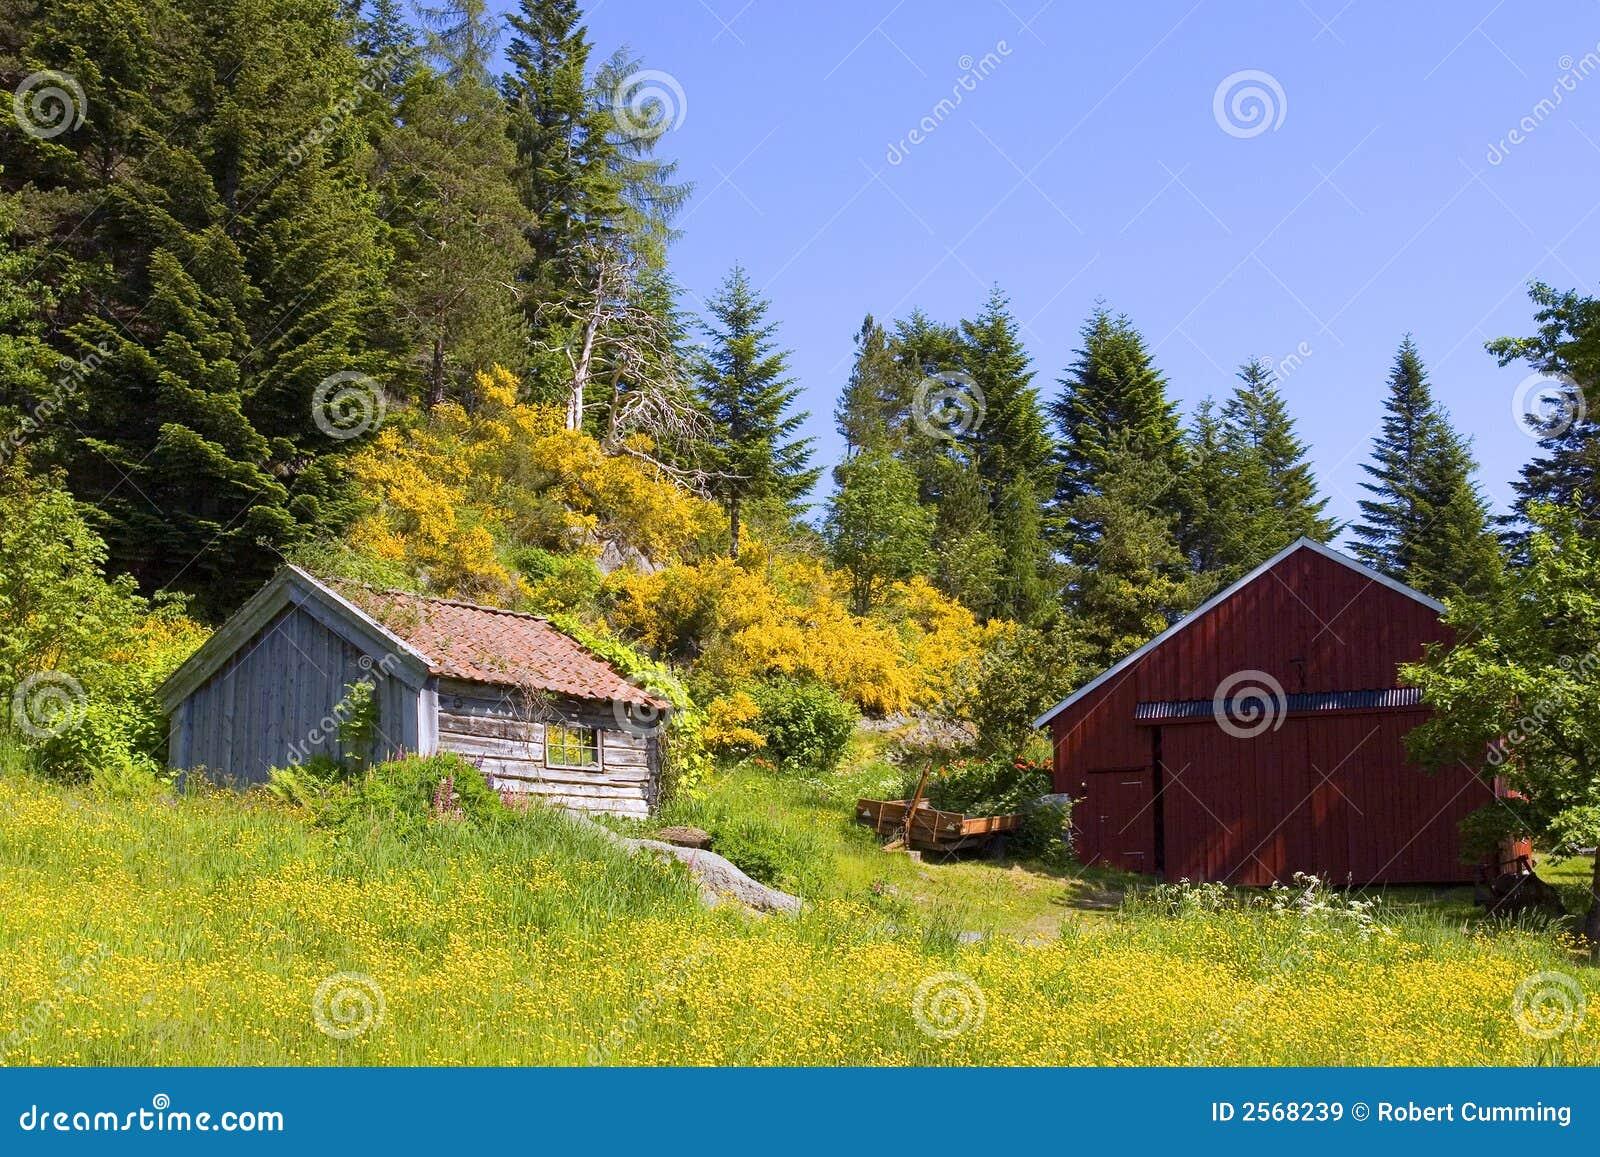 Mount barn